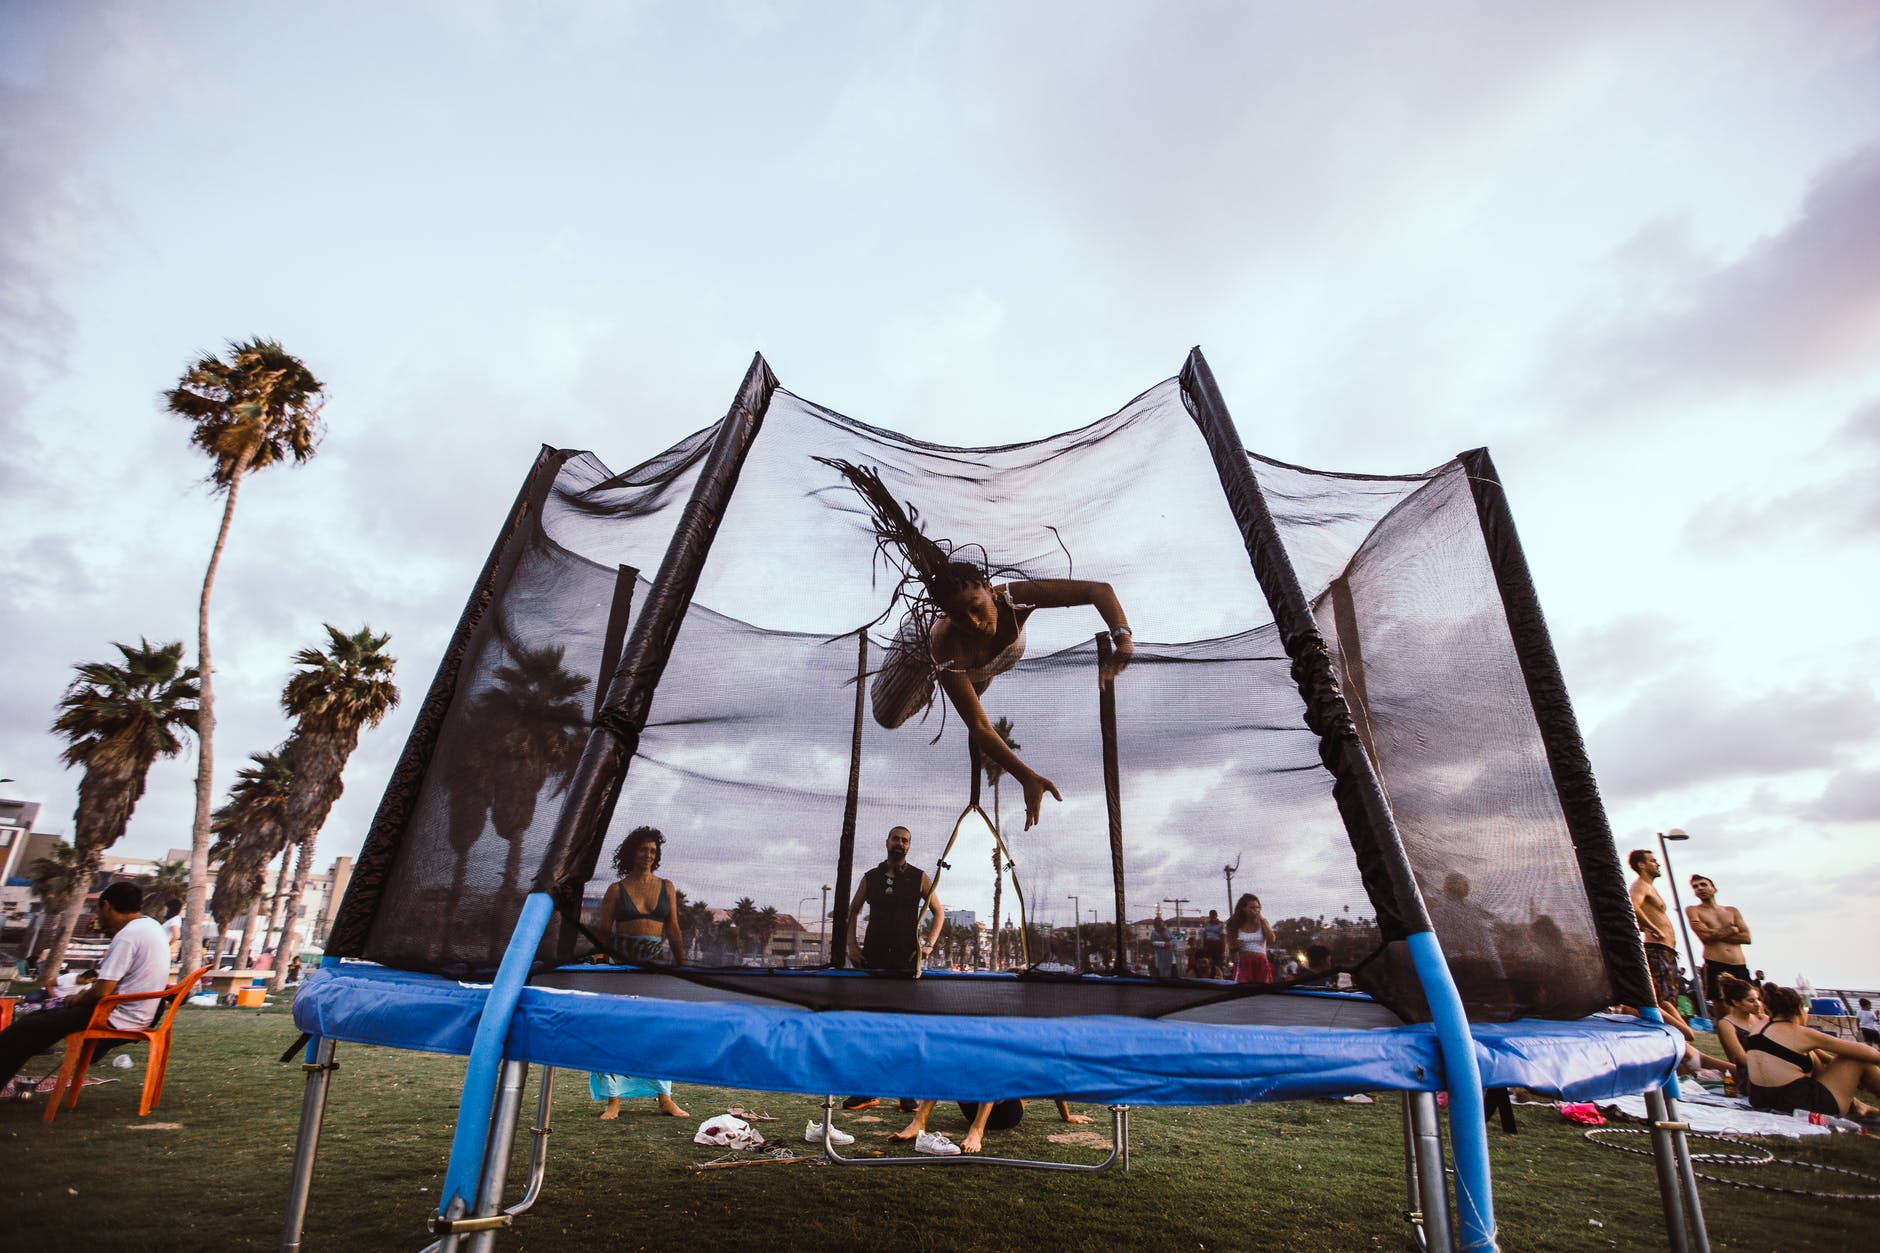 trampoline, thelashop, backyard upgrades